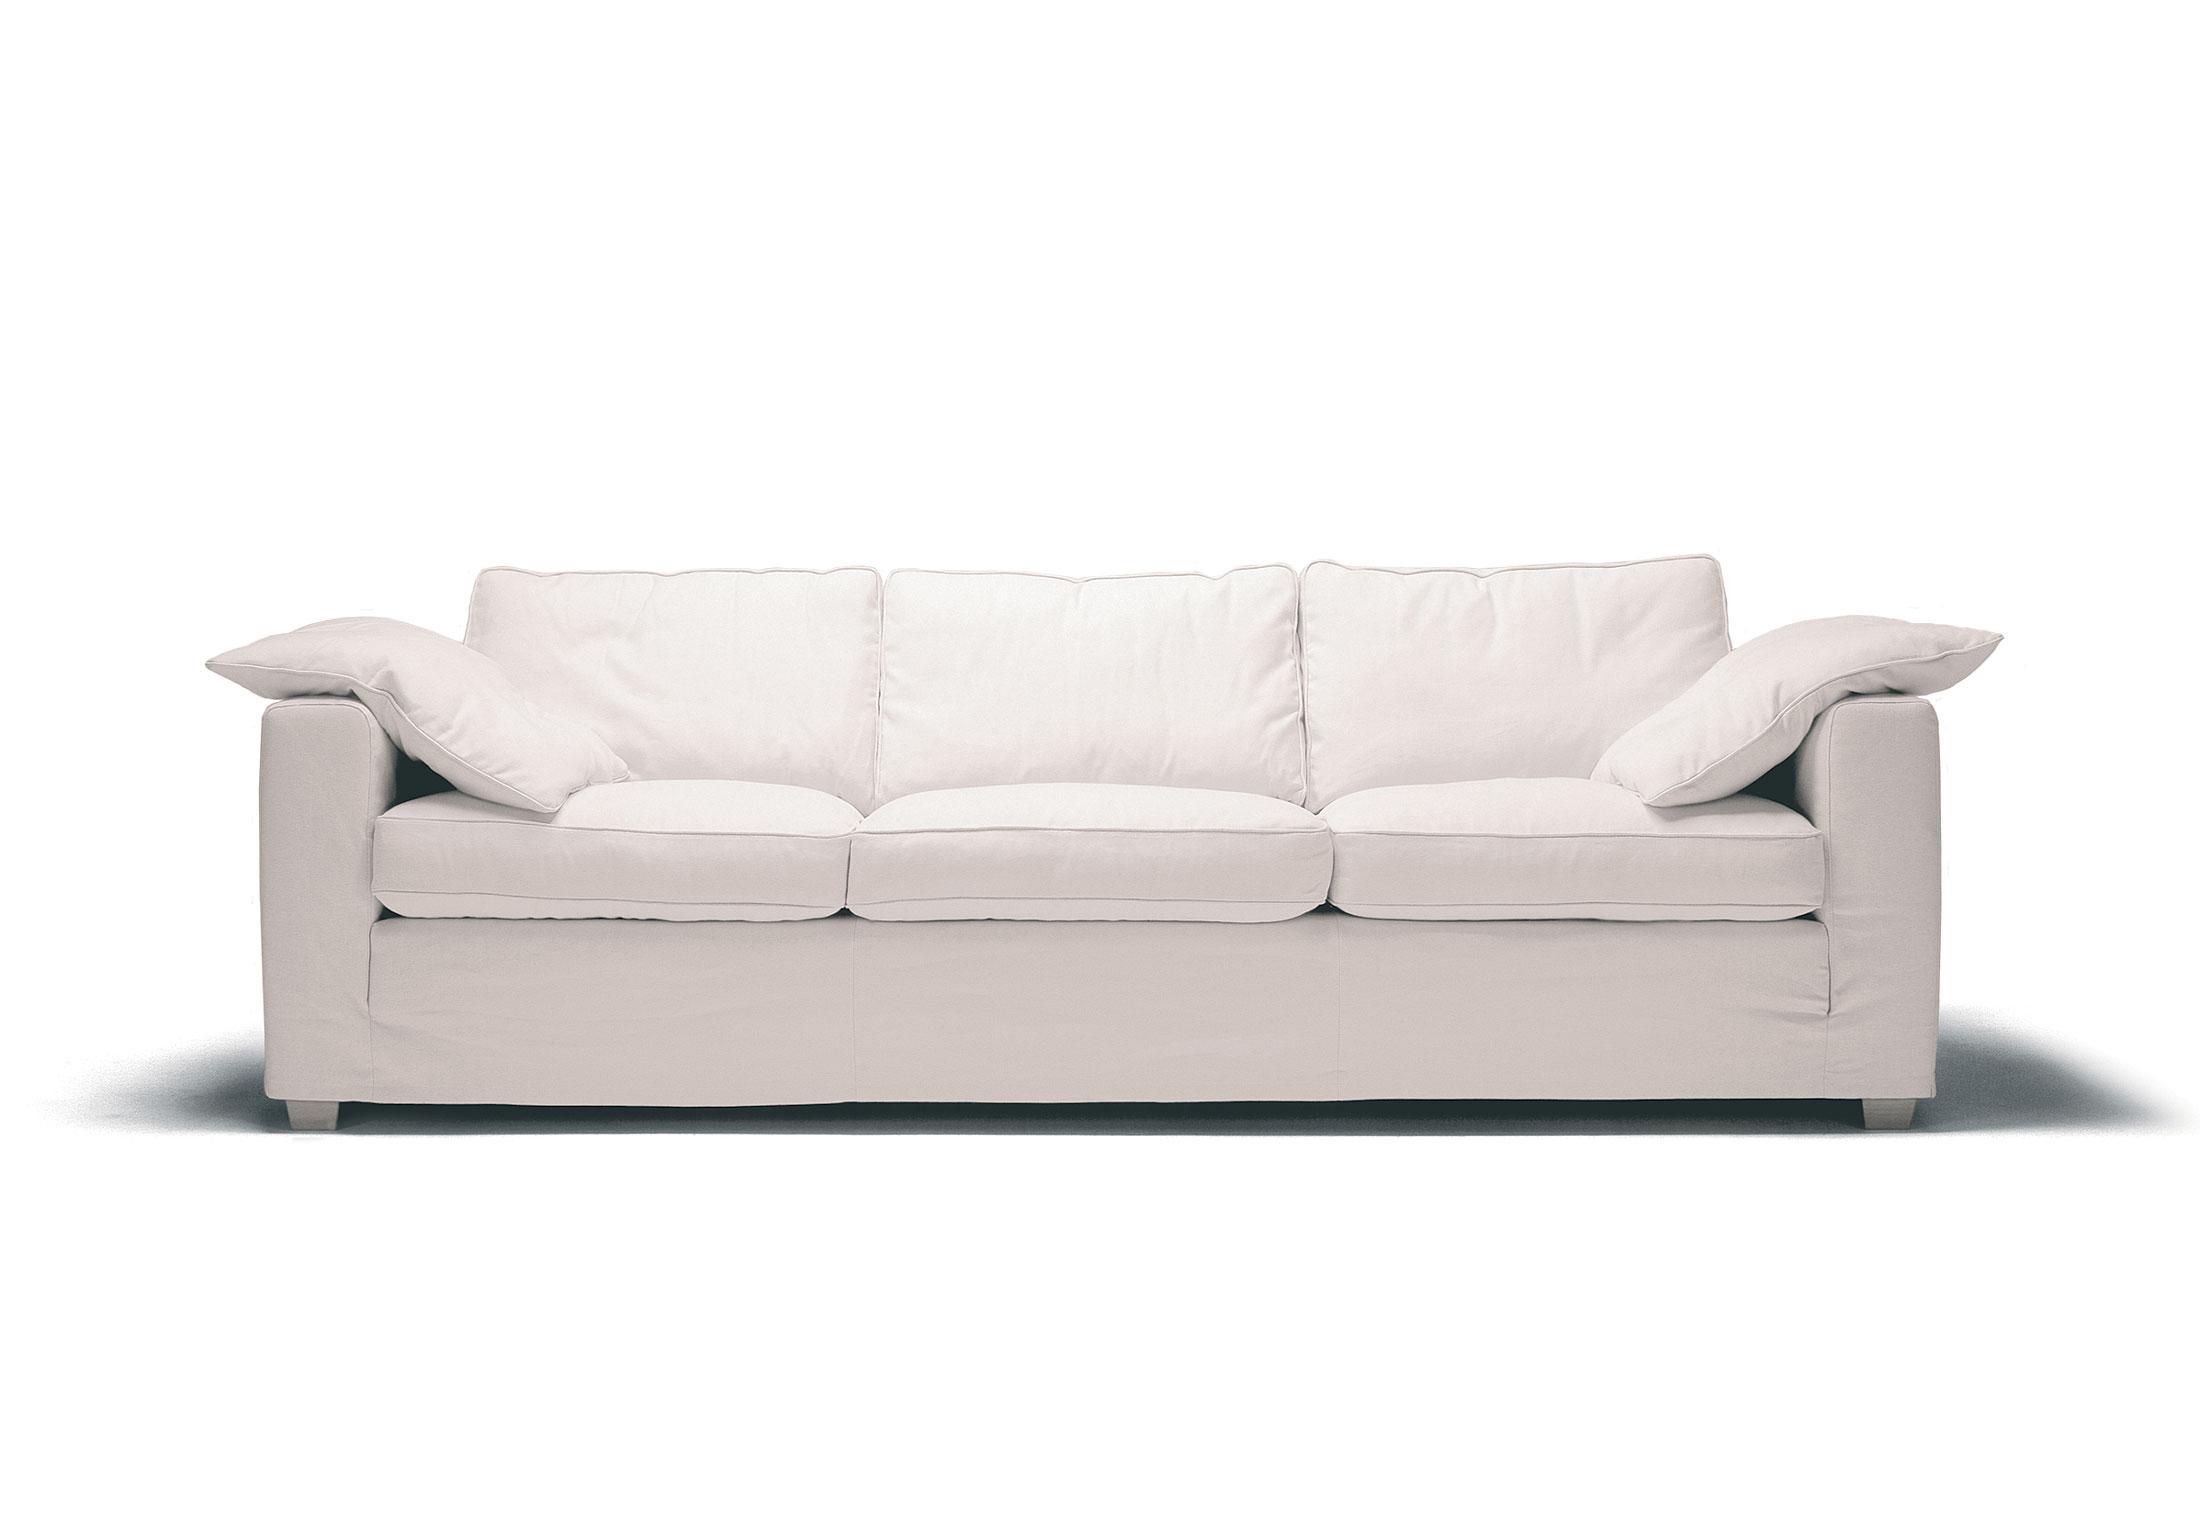 Easy living sofas home the honoroak for Easy living home